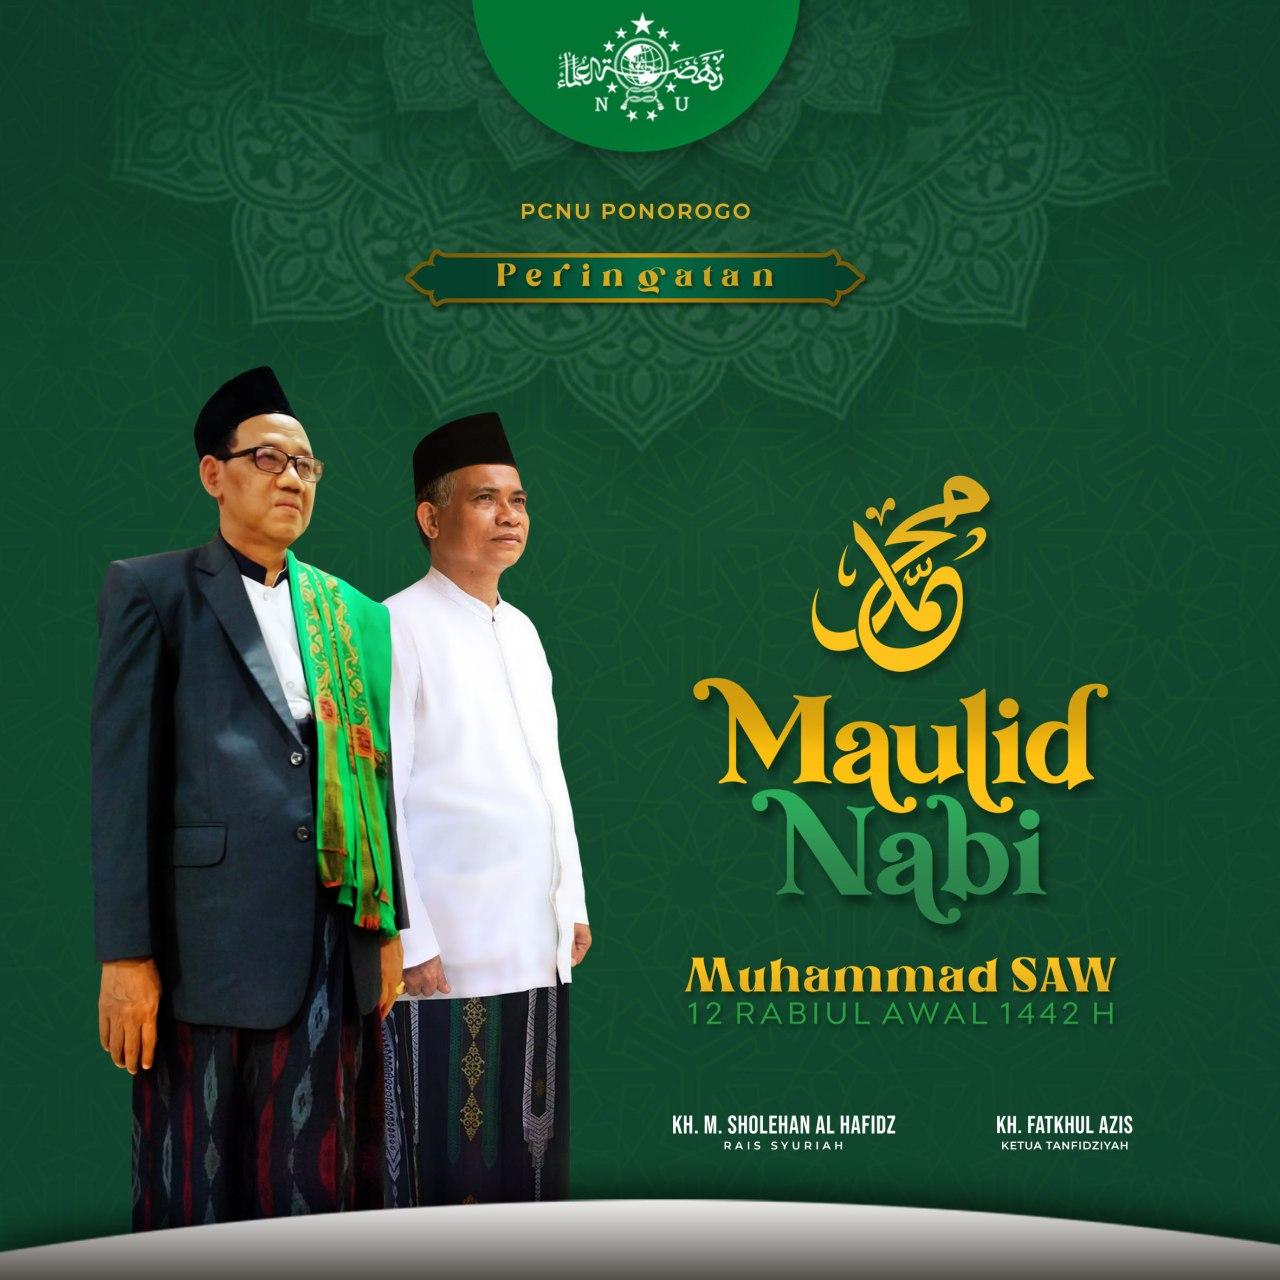 Rois Syuriah NU Ponorogo Ingatkan Maulid Nabi Muhammad SAW